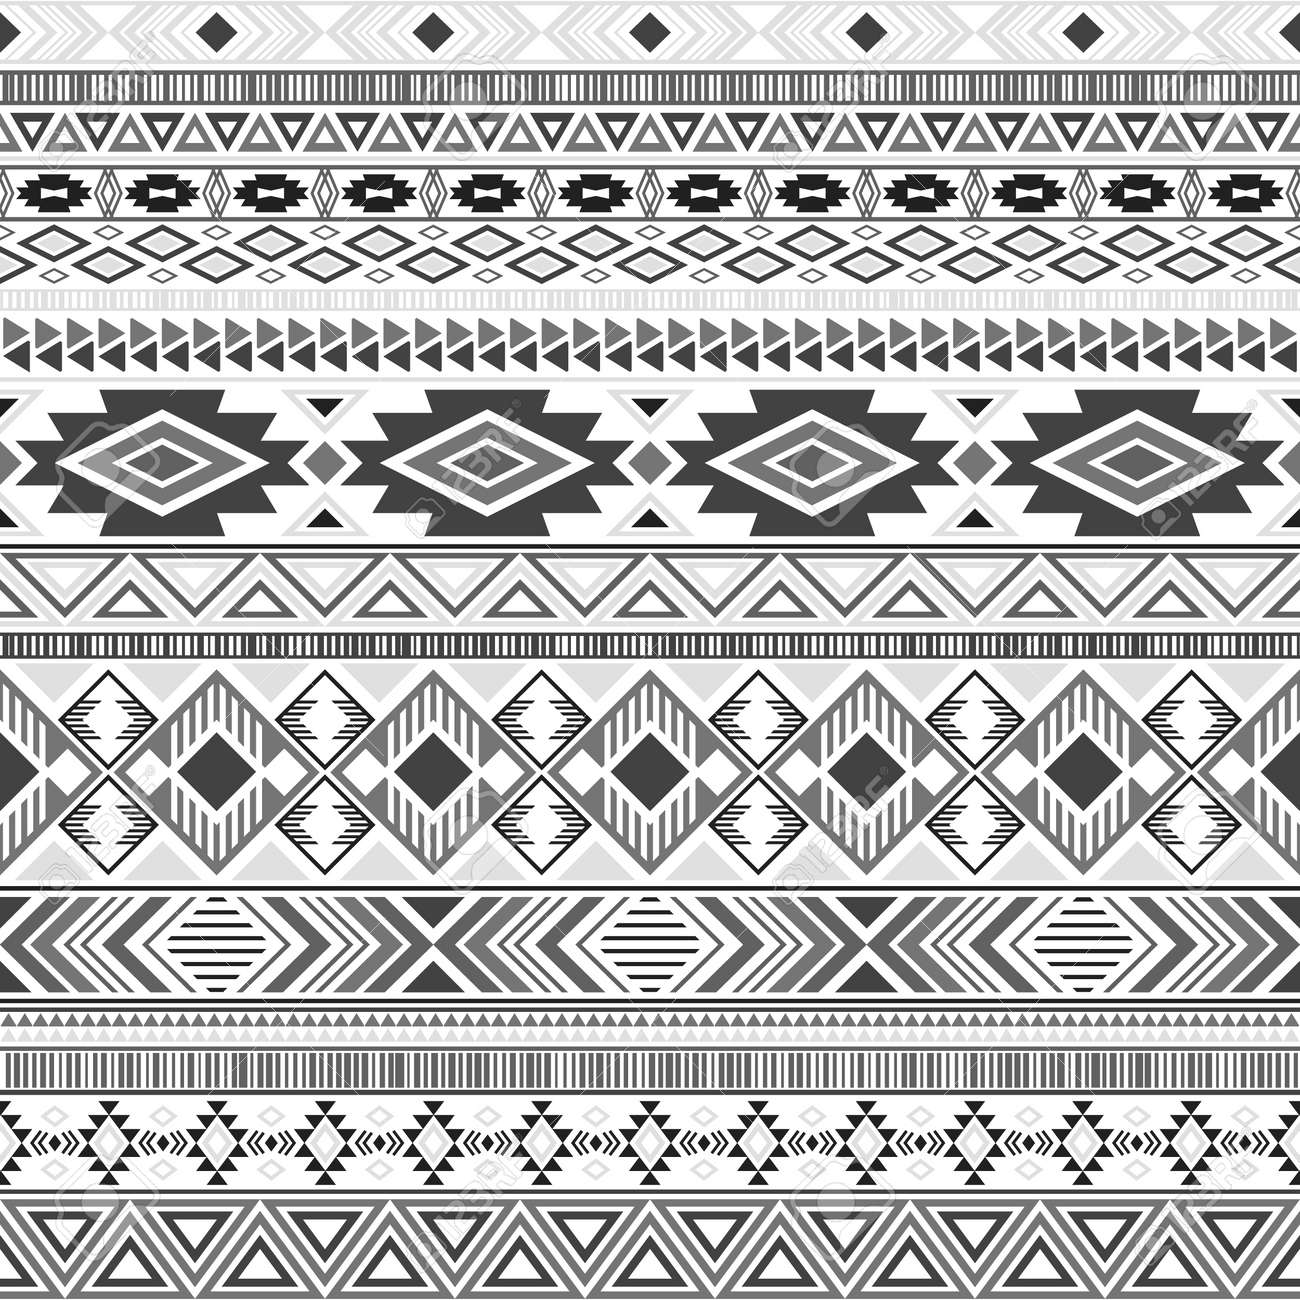 Aztec american indian pattern tribal ethnic motifs geometric vector background. Vintage native american tribal motifs clothing fabric ethnic traditional design. Mayan clothes pattern design. - 134433966